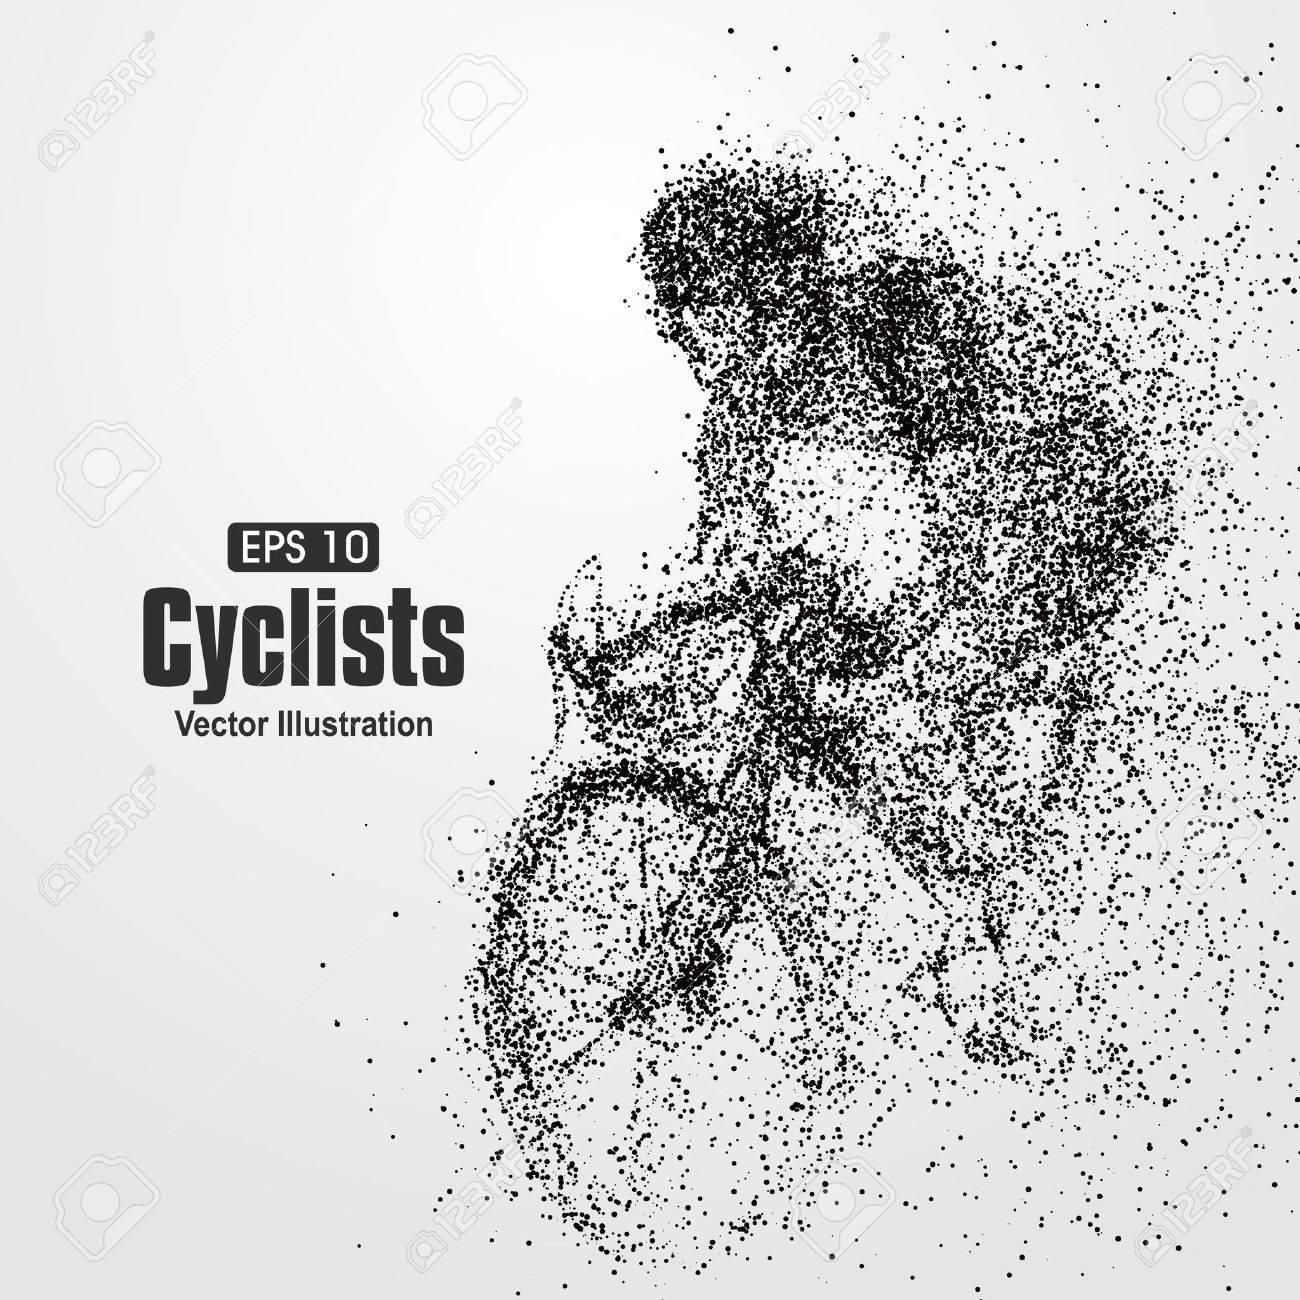 Cyclists, particle divergent composition, vector illustration. - 52744225